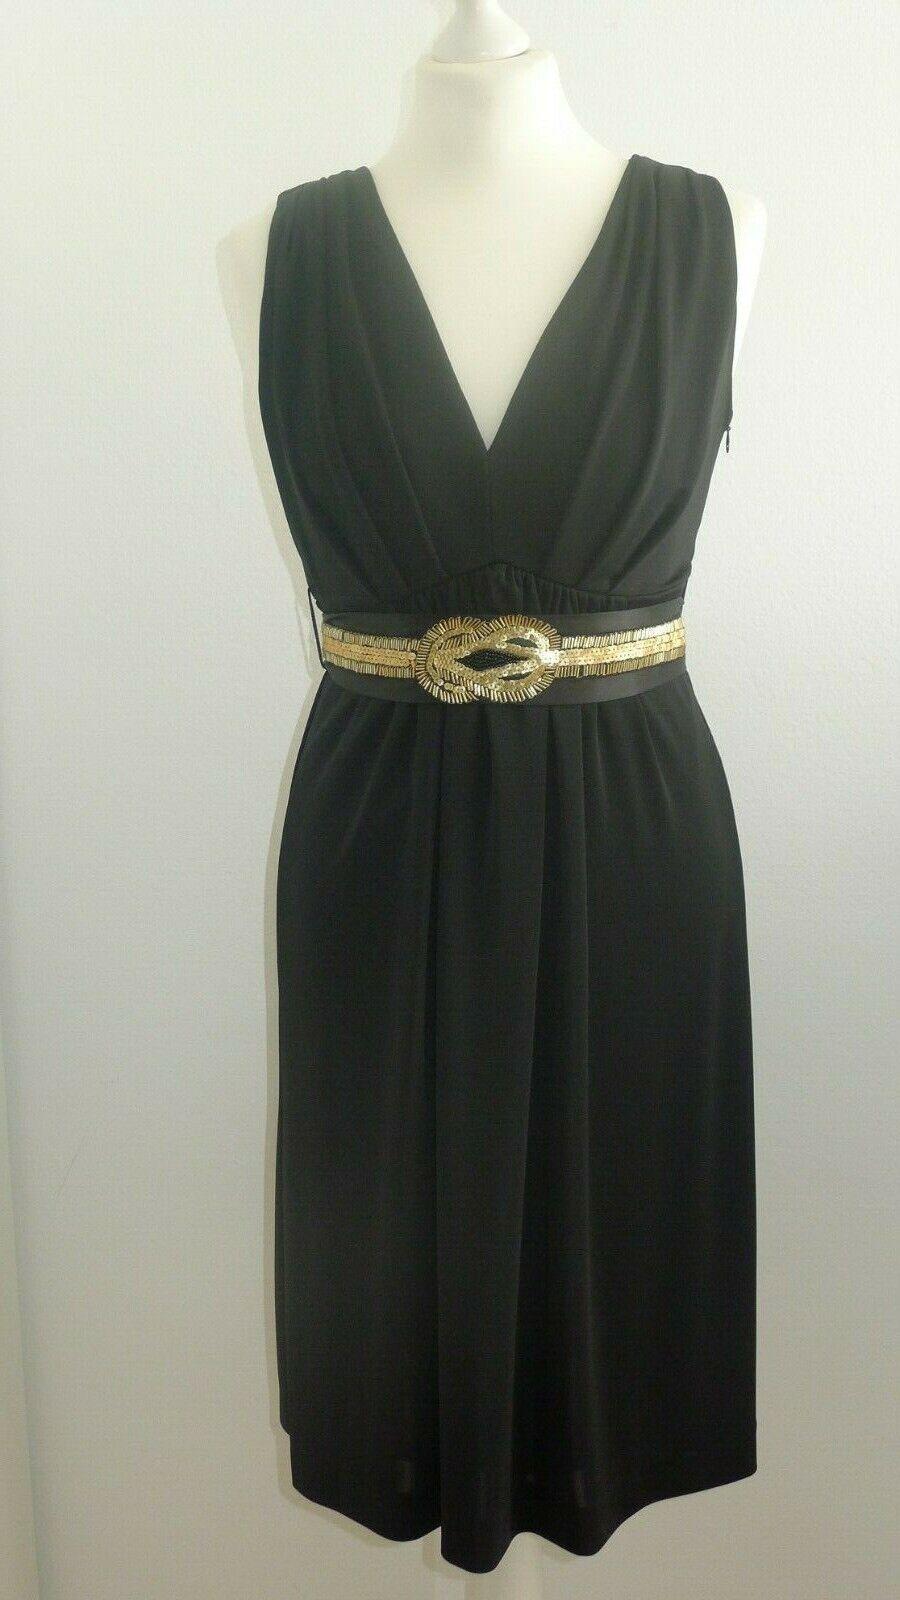 Ana Alcazar Kleid Elegant Gr. 36   S schwarz Gold  NEU